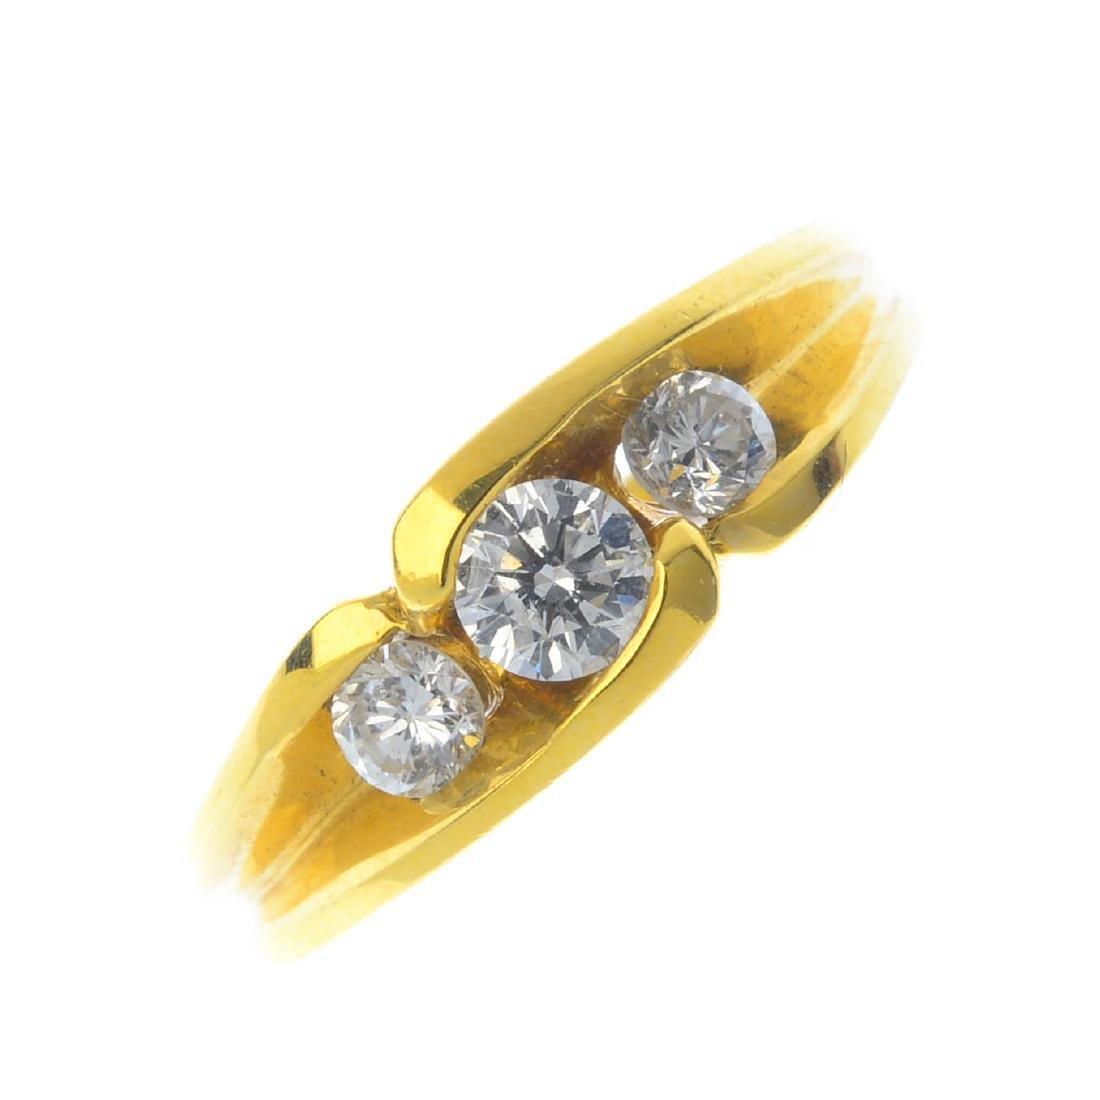 An 18ct gold diamond three-stone ring. The graduated